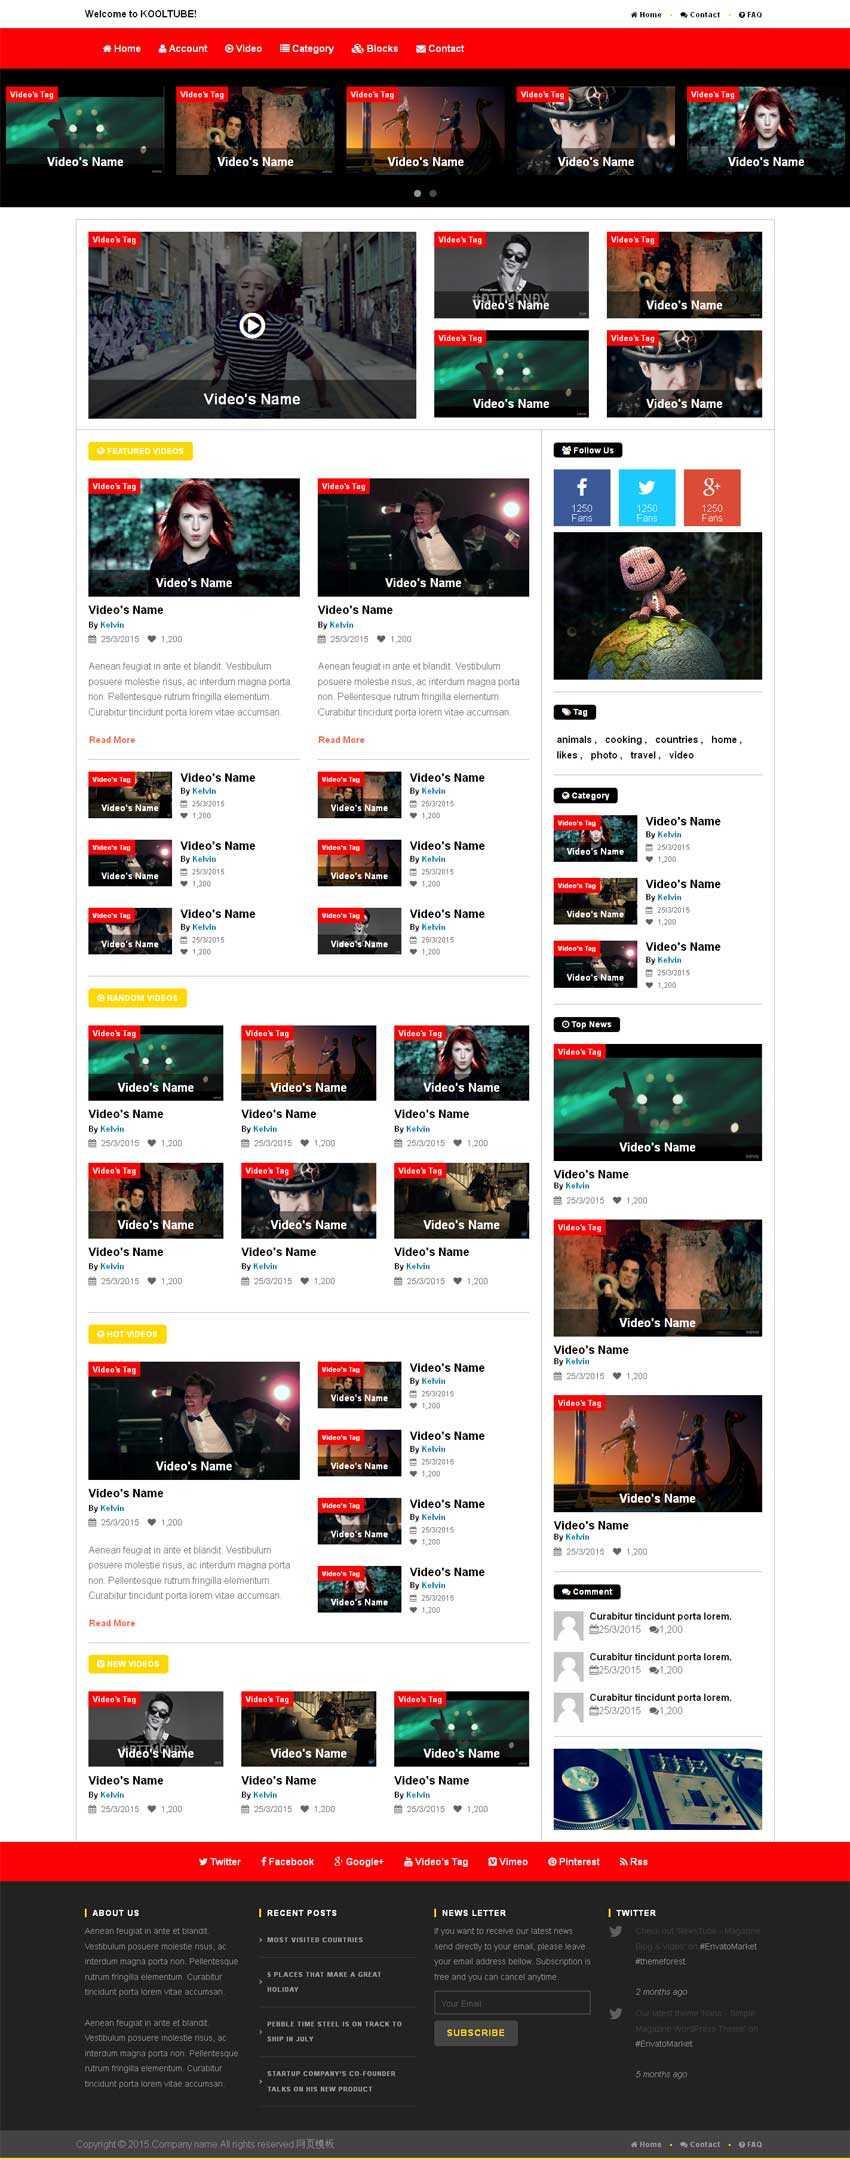 html5 css3红色国外娱乐视频网站模板源码